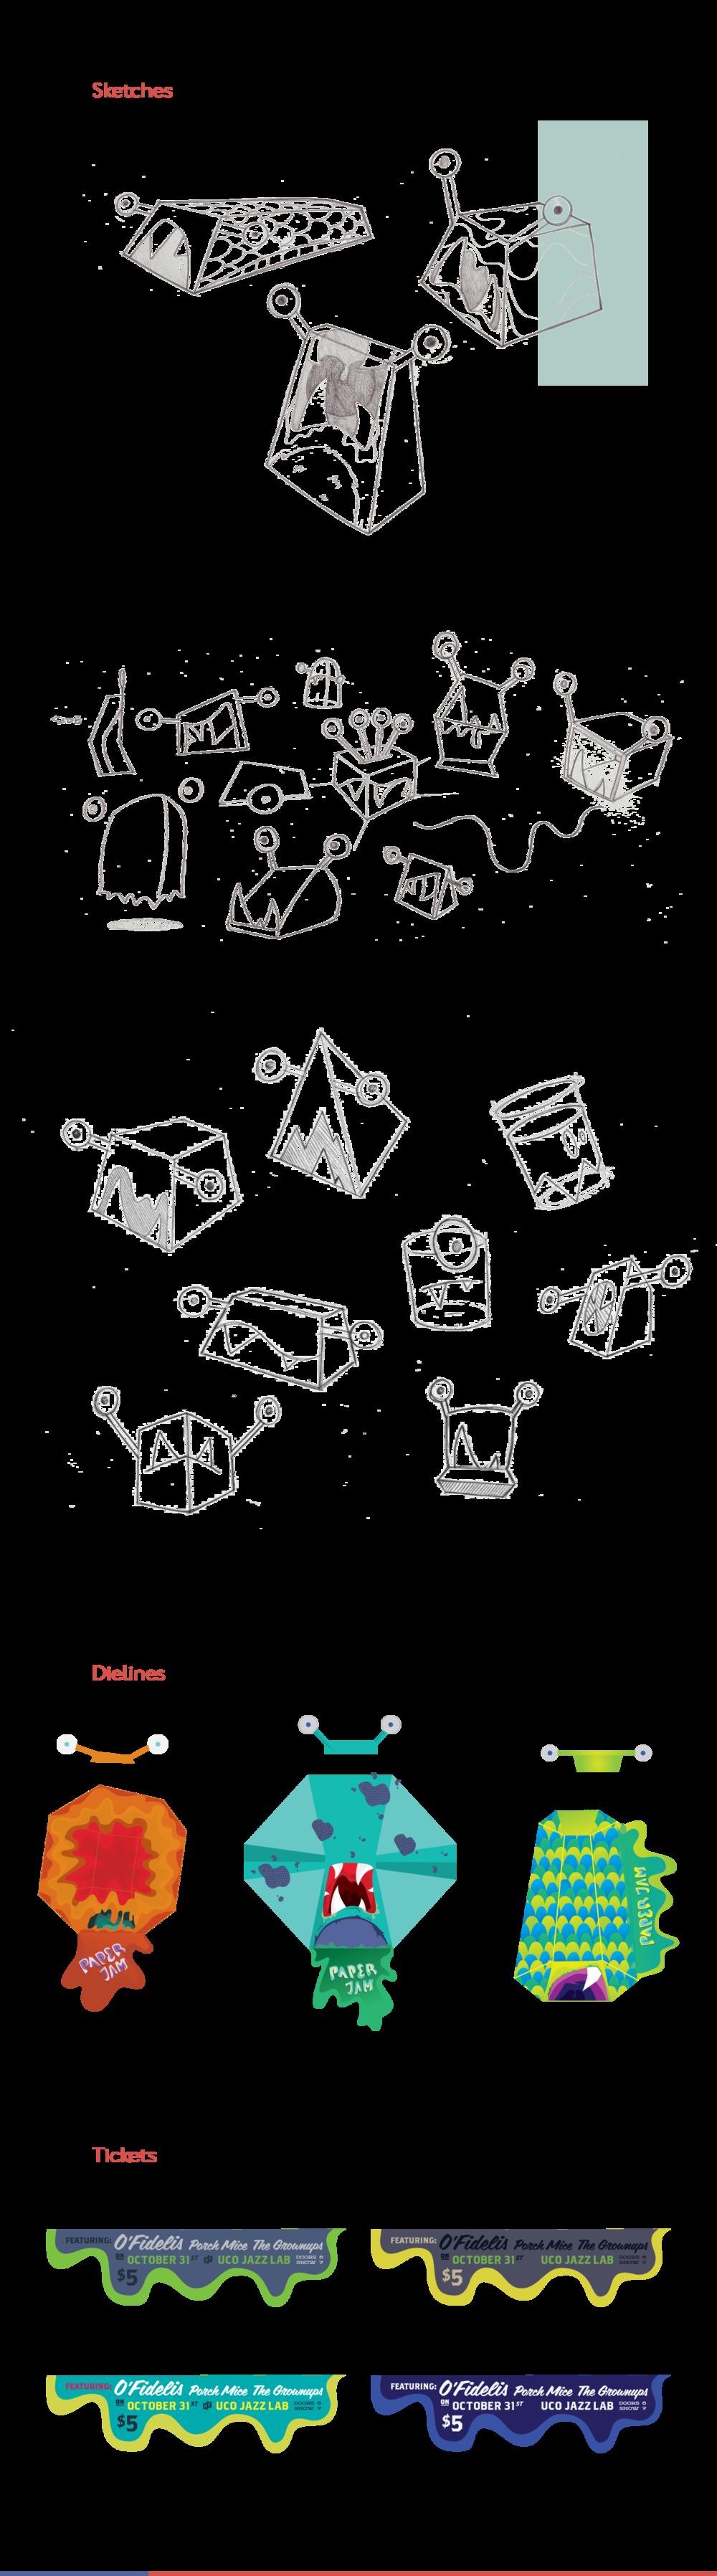 Paper Jam - Squarespace-02.png